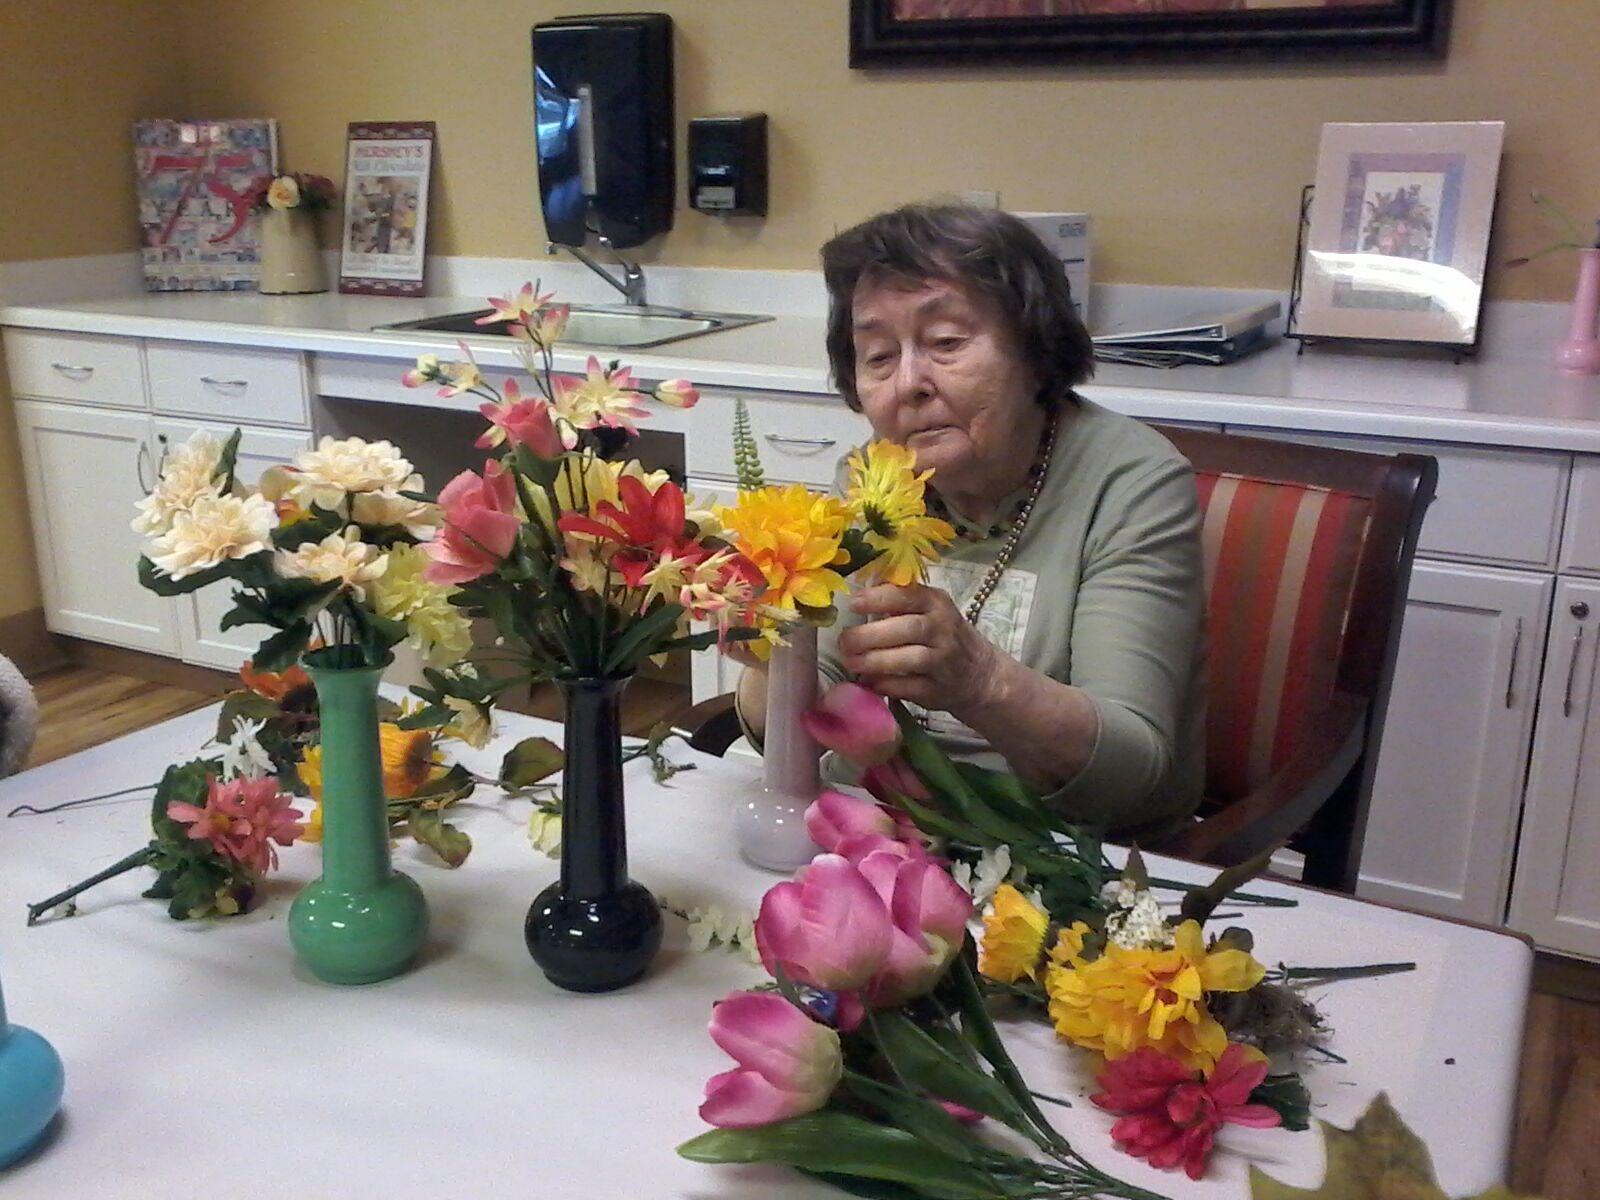 Garden courte memory care community in olympia wa 98506 for Washington gardens memory care